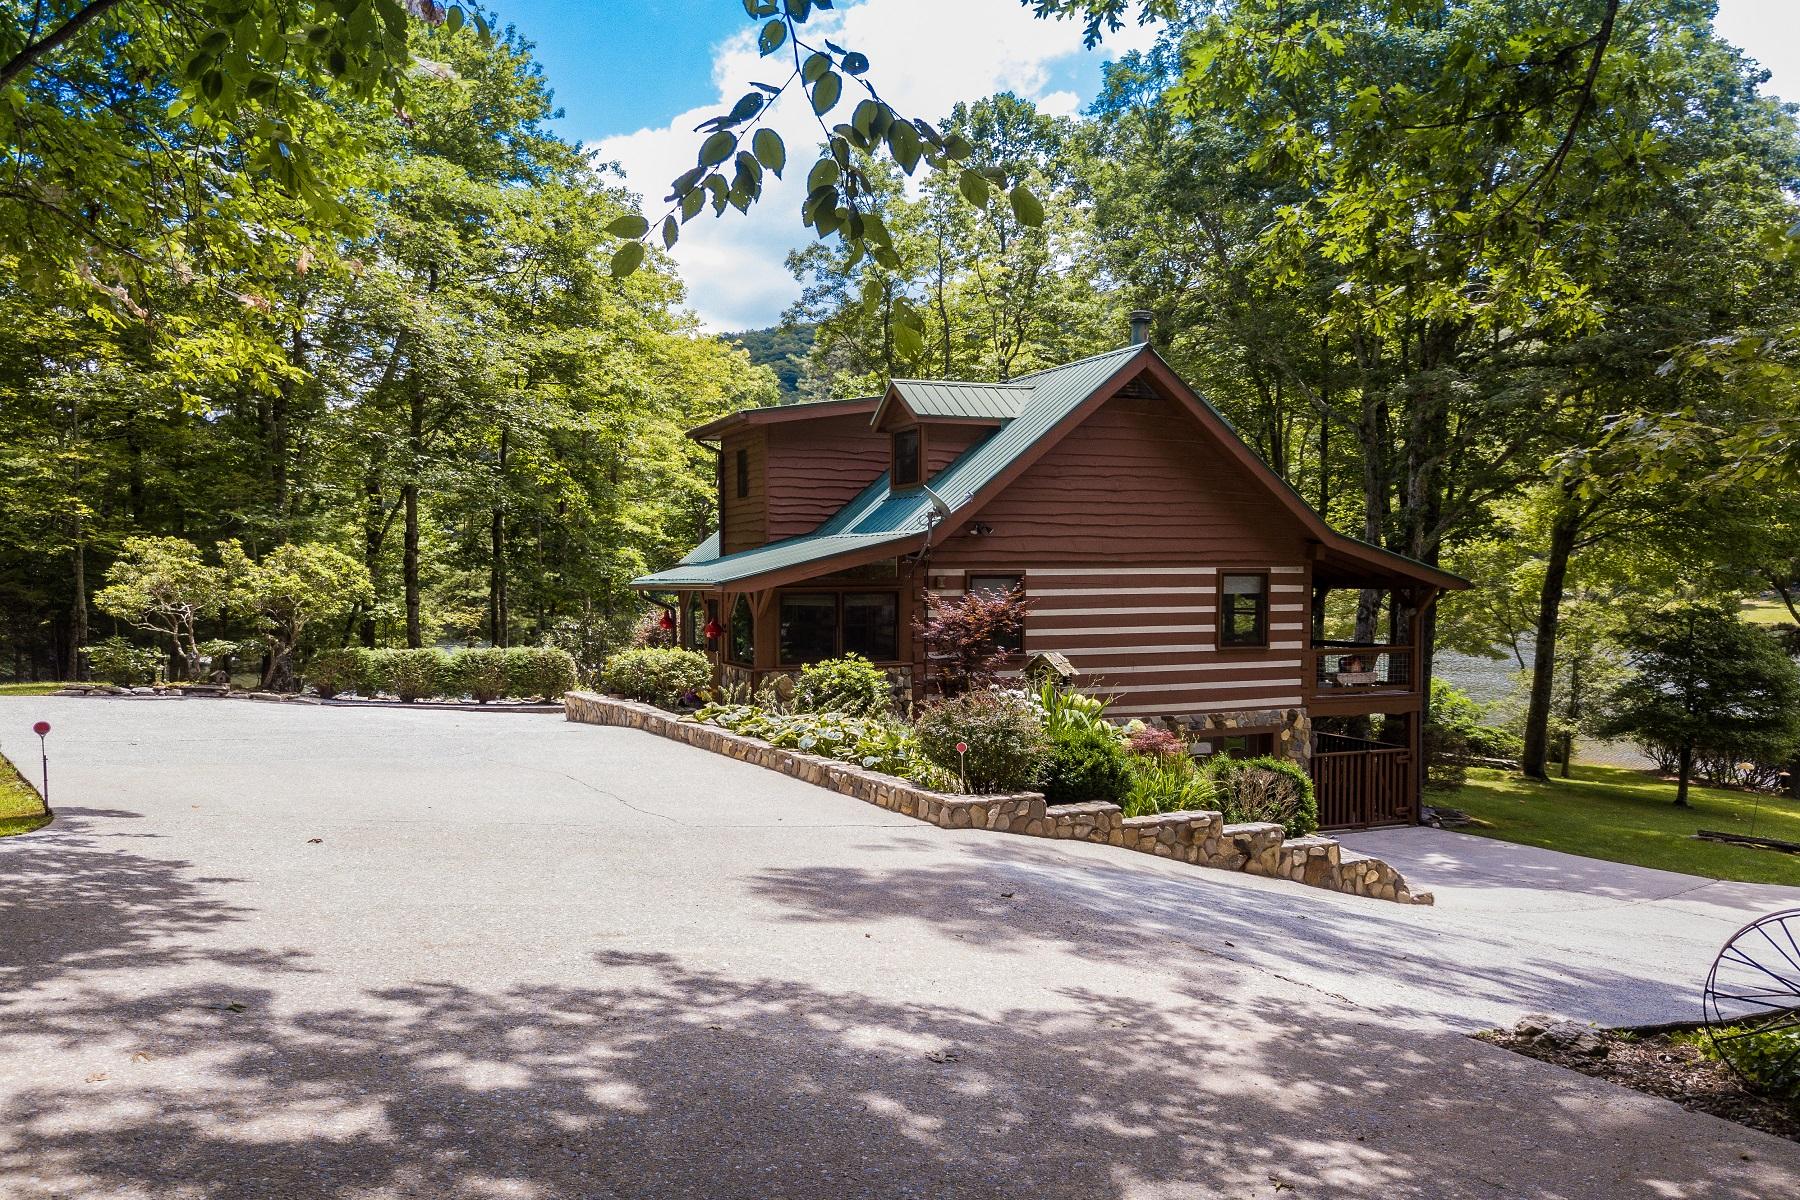 Single Family Homes για την Πώληση στο Bowen 265 Rocky Knob Lane, Scaly Mountain, Βορεια Καρολινα 28775 Ηνωμένες Πολιτείες